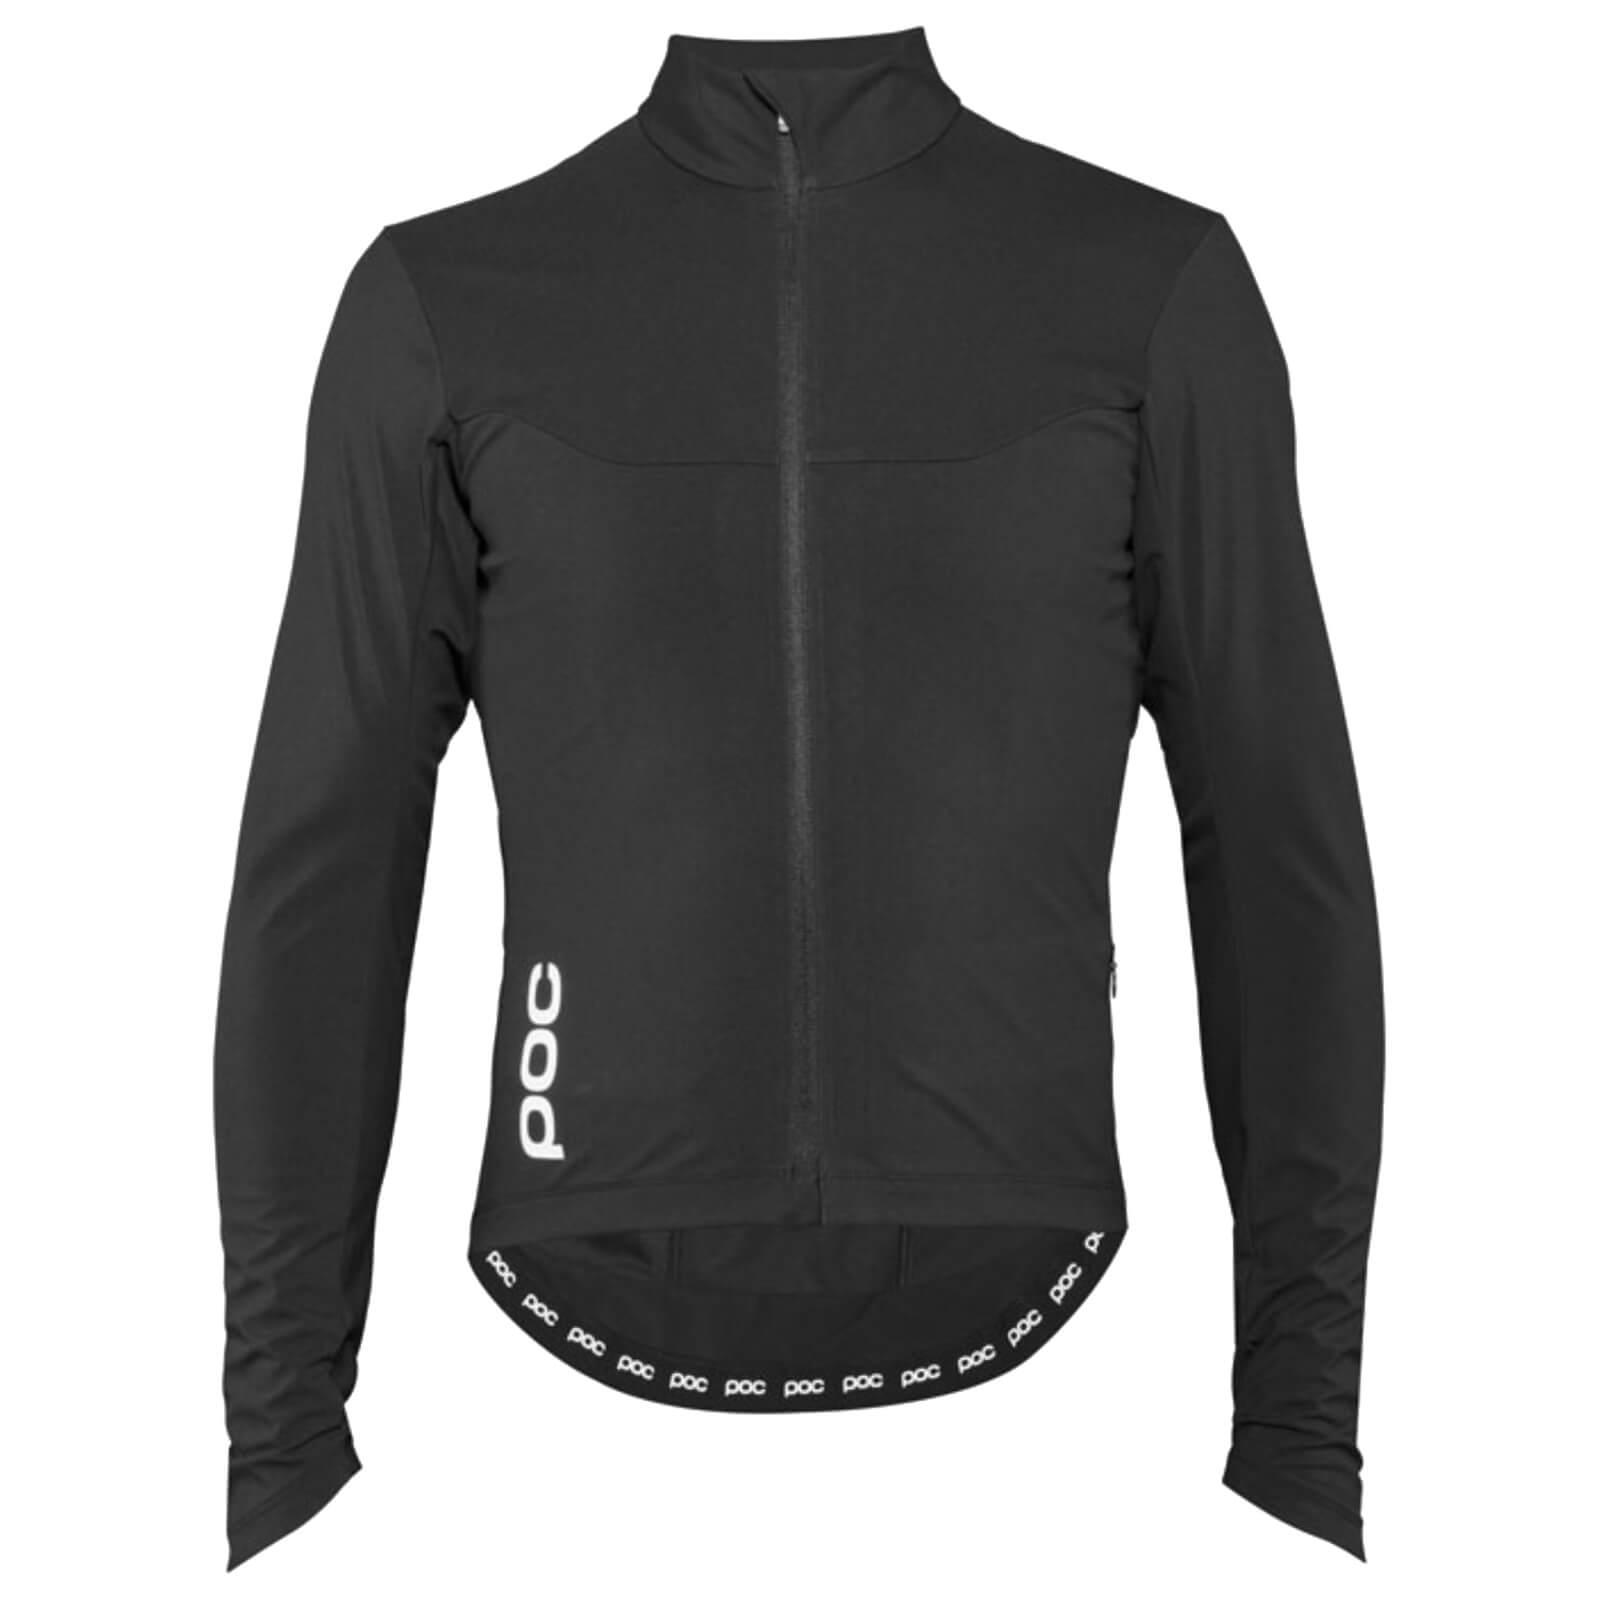 POC Essential Road Windproof Jersey - M - Black